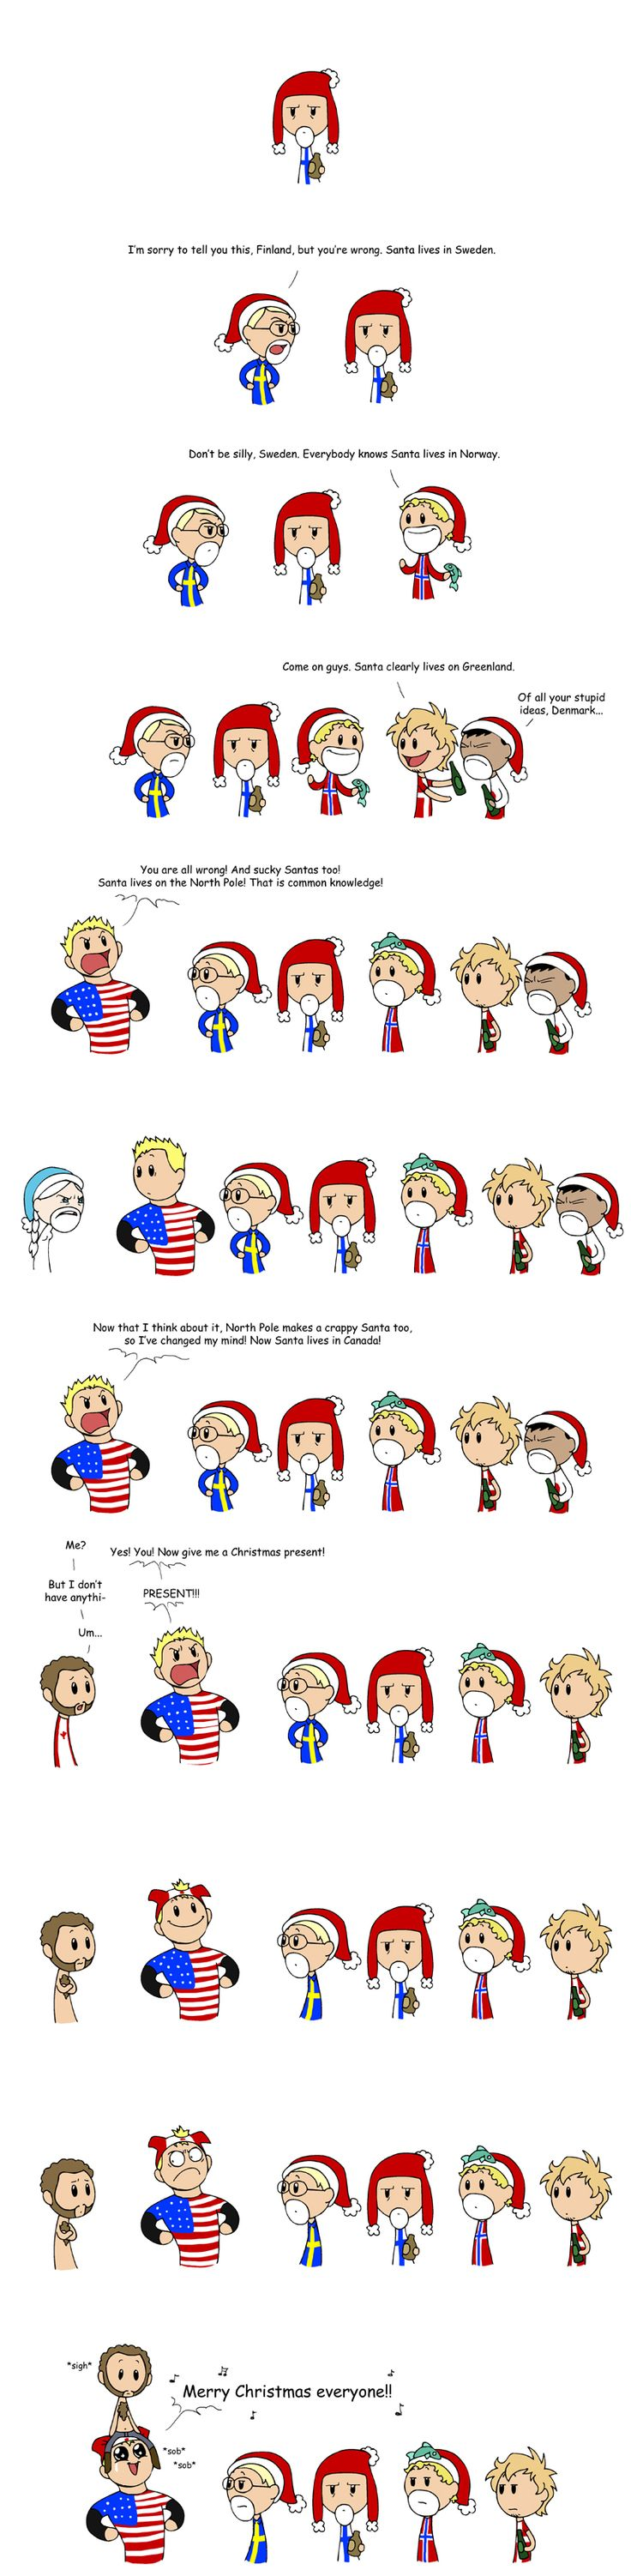 A Scandinavia and the World Merry Christmas